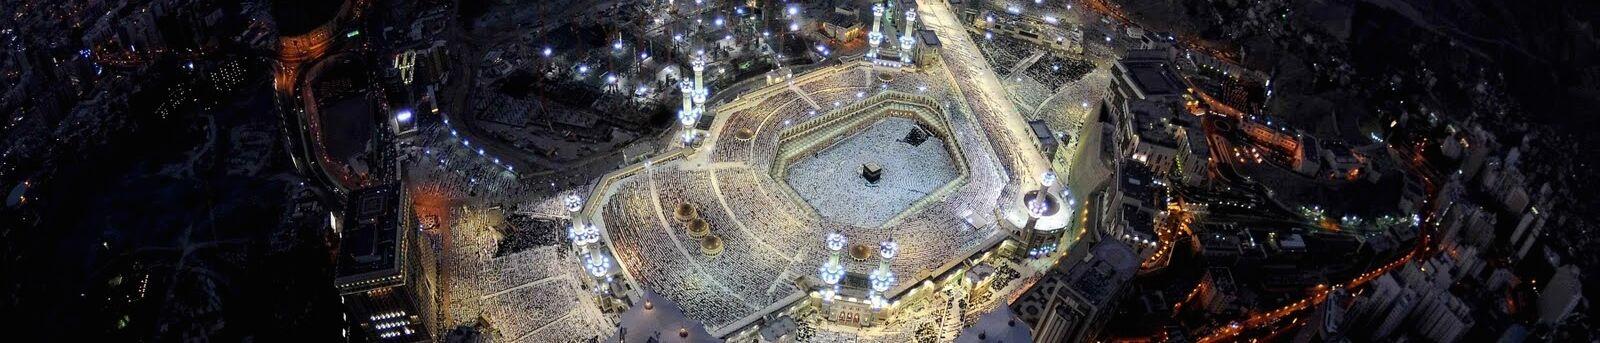 Islamic.jewelry